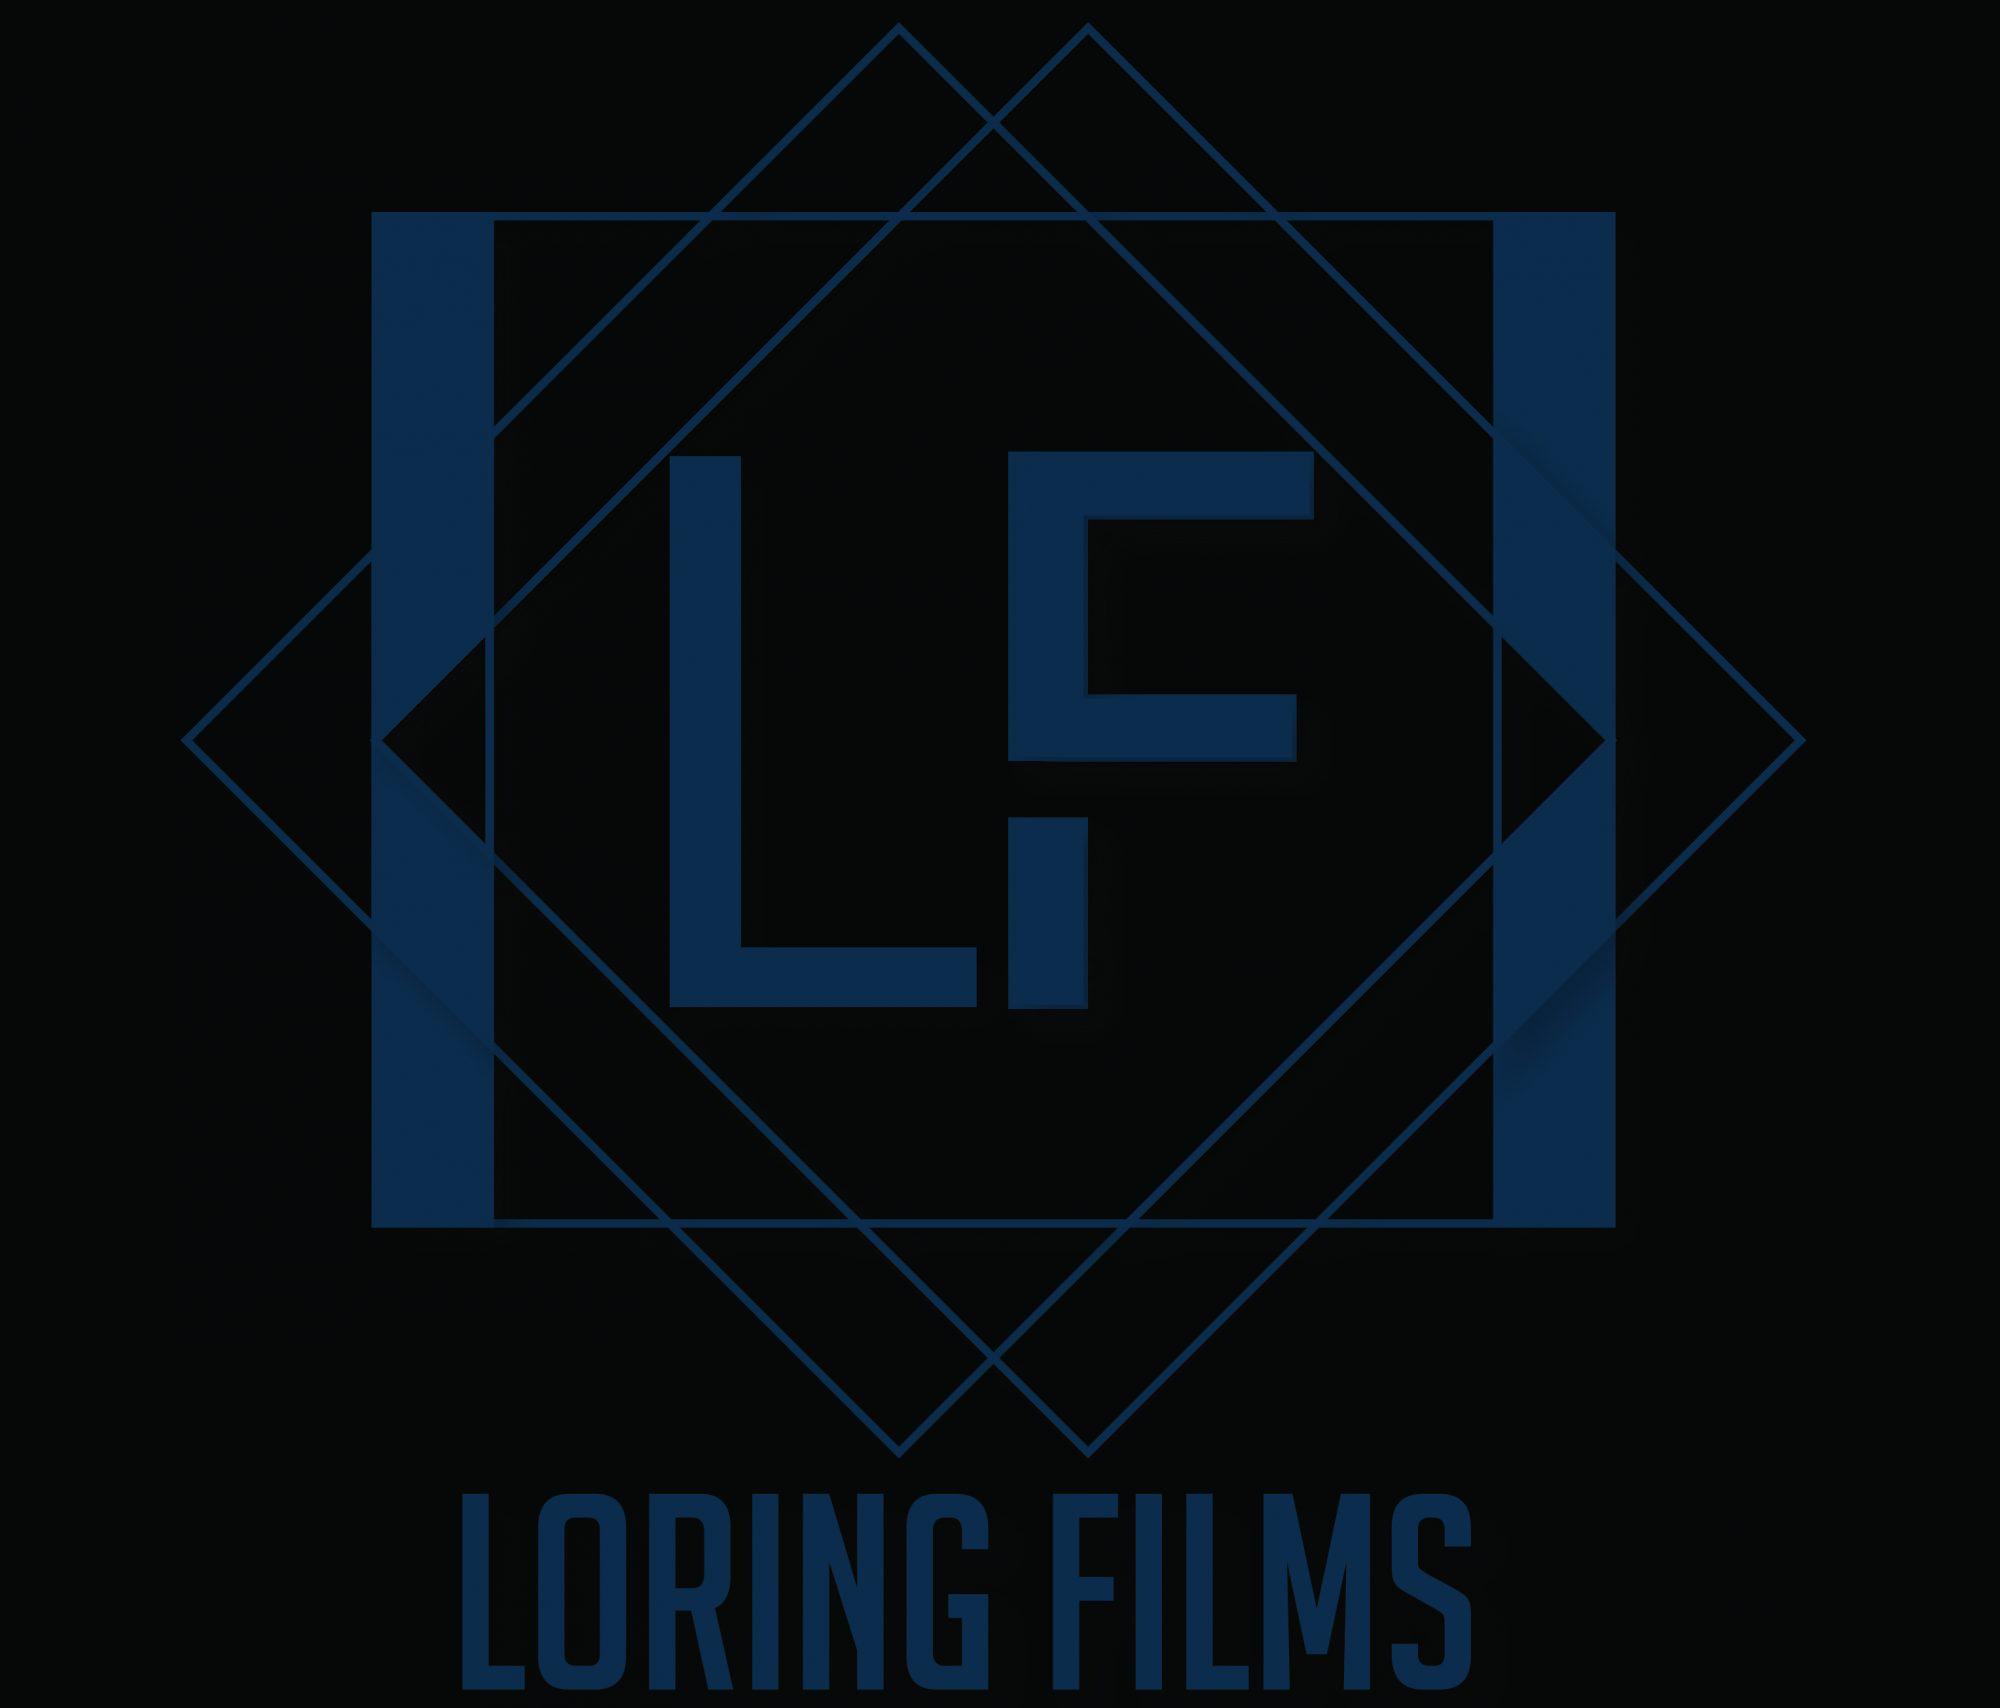 Loring Films